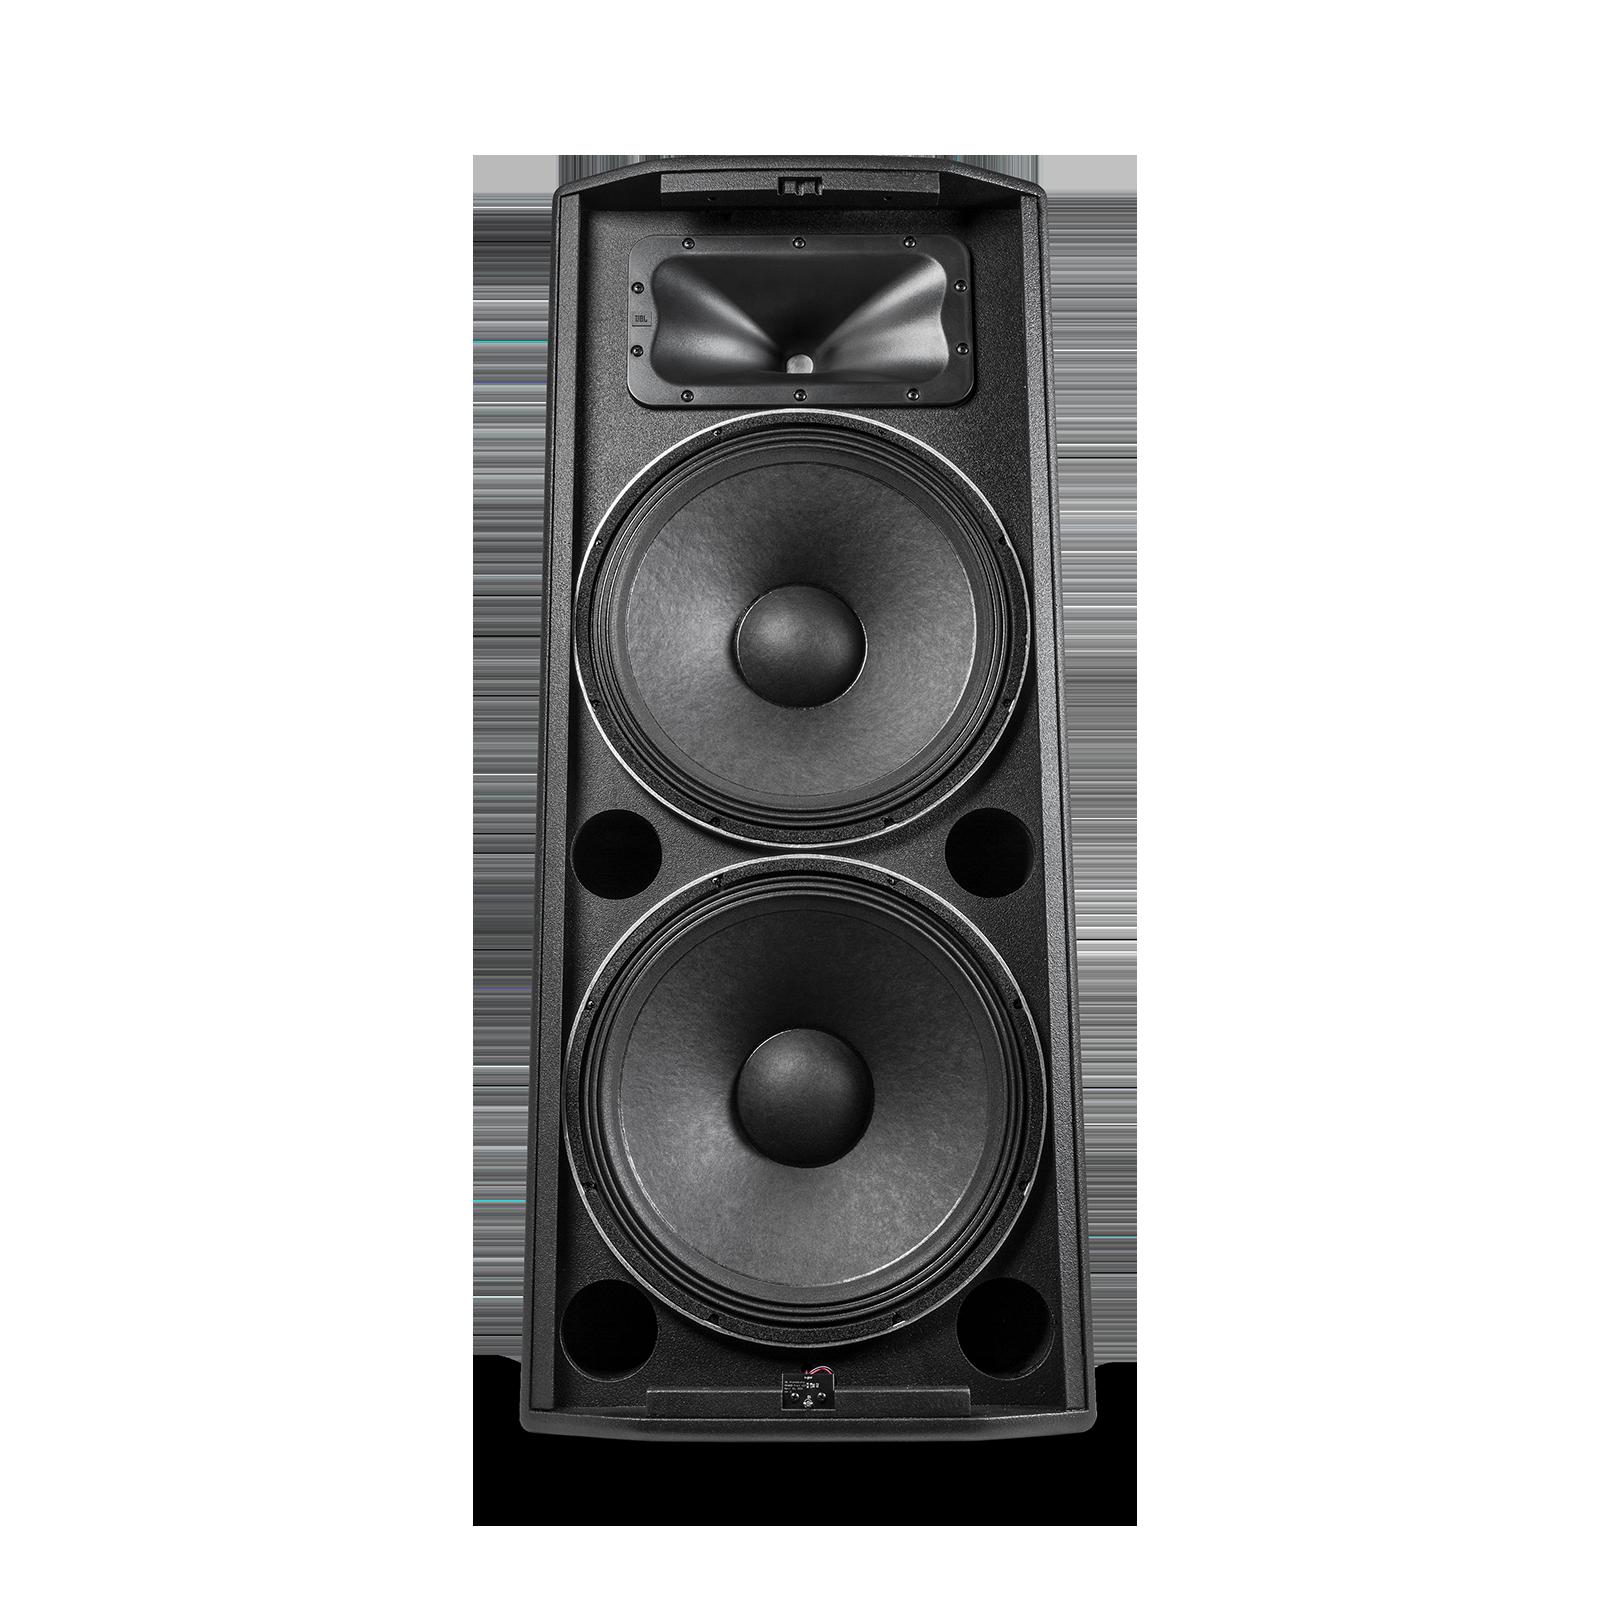 "JBL PRX825 - Black - Dual 15"" Two-Way Full-Range Main System with Wi-Fi - Detailshot 2"